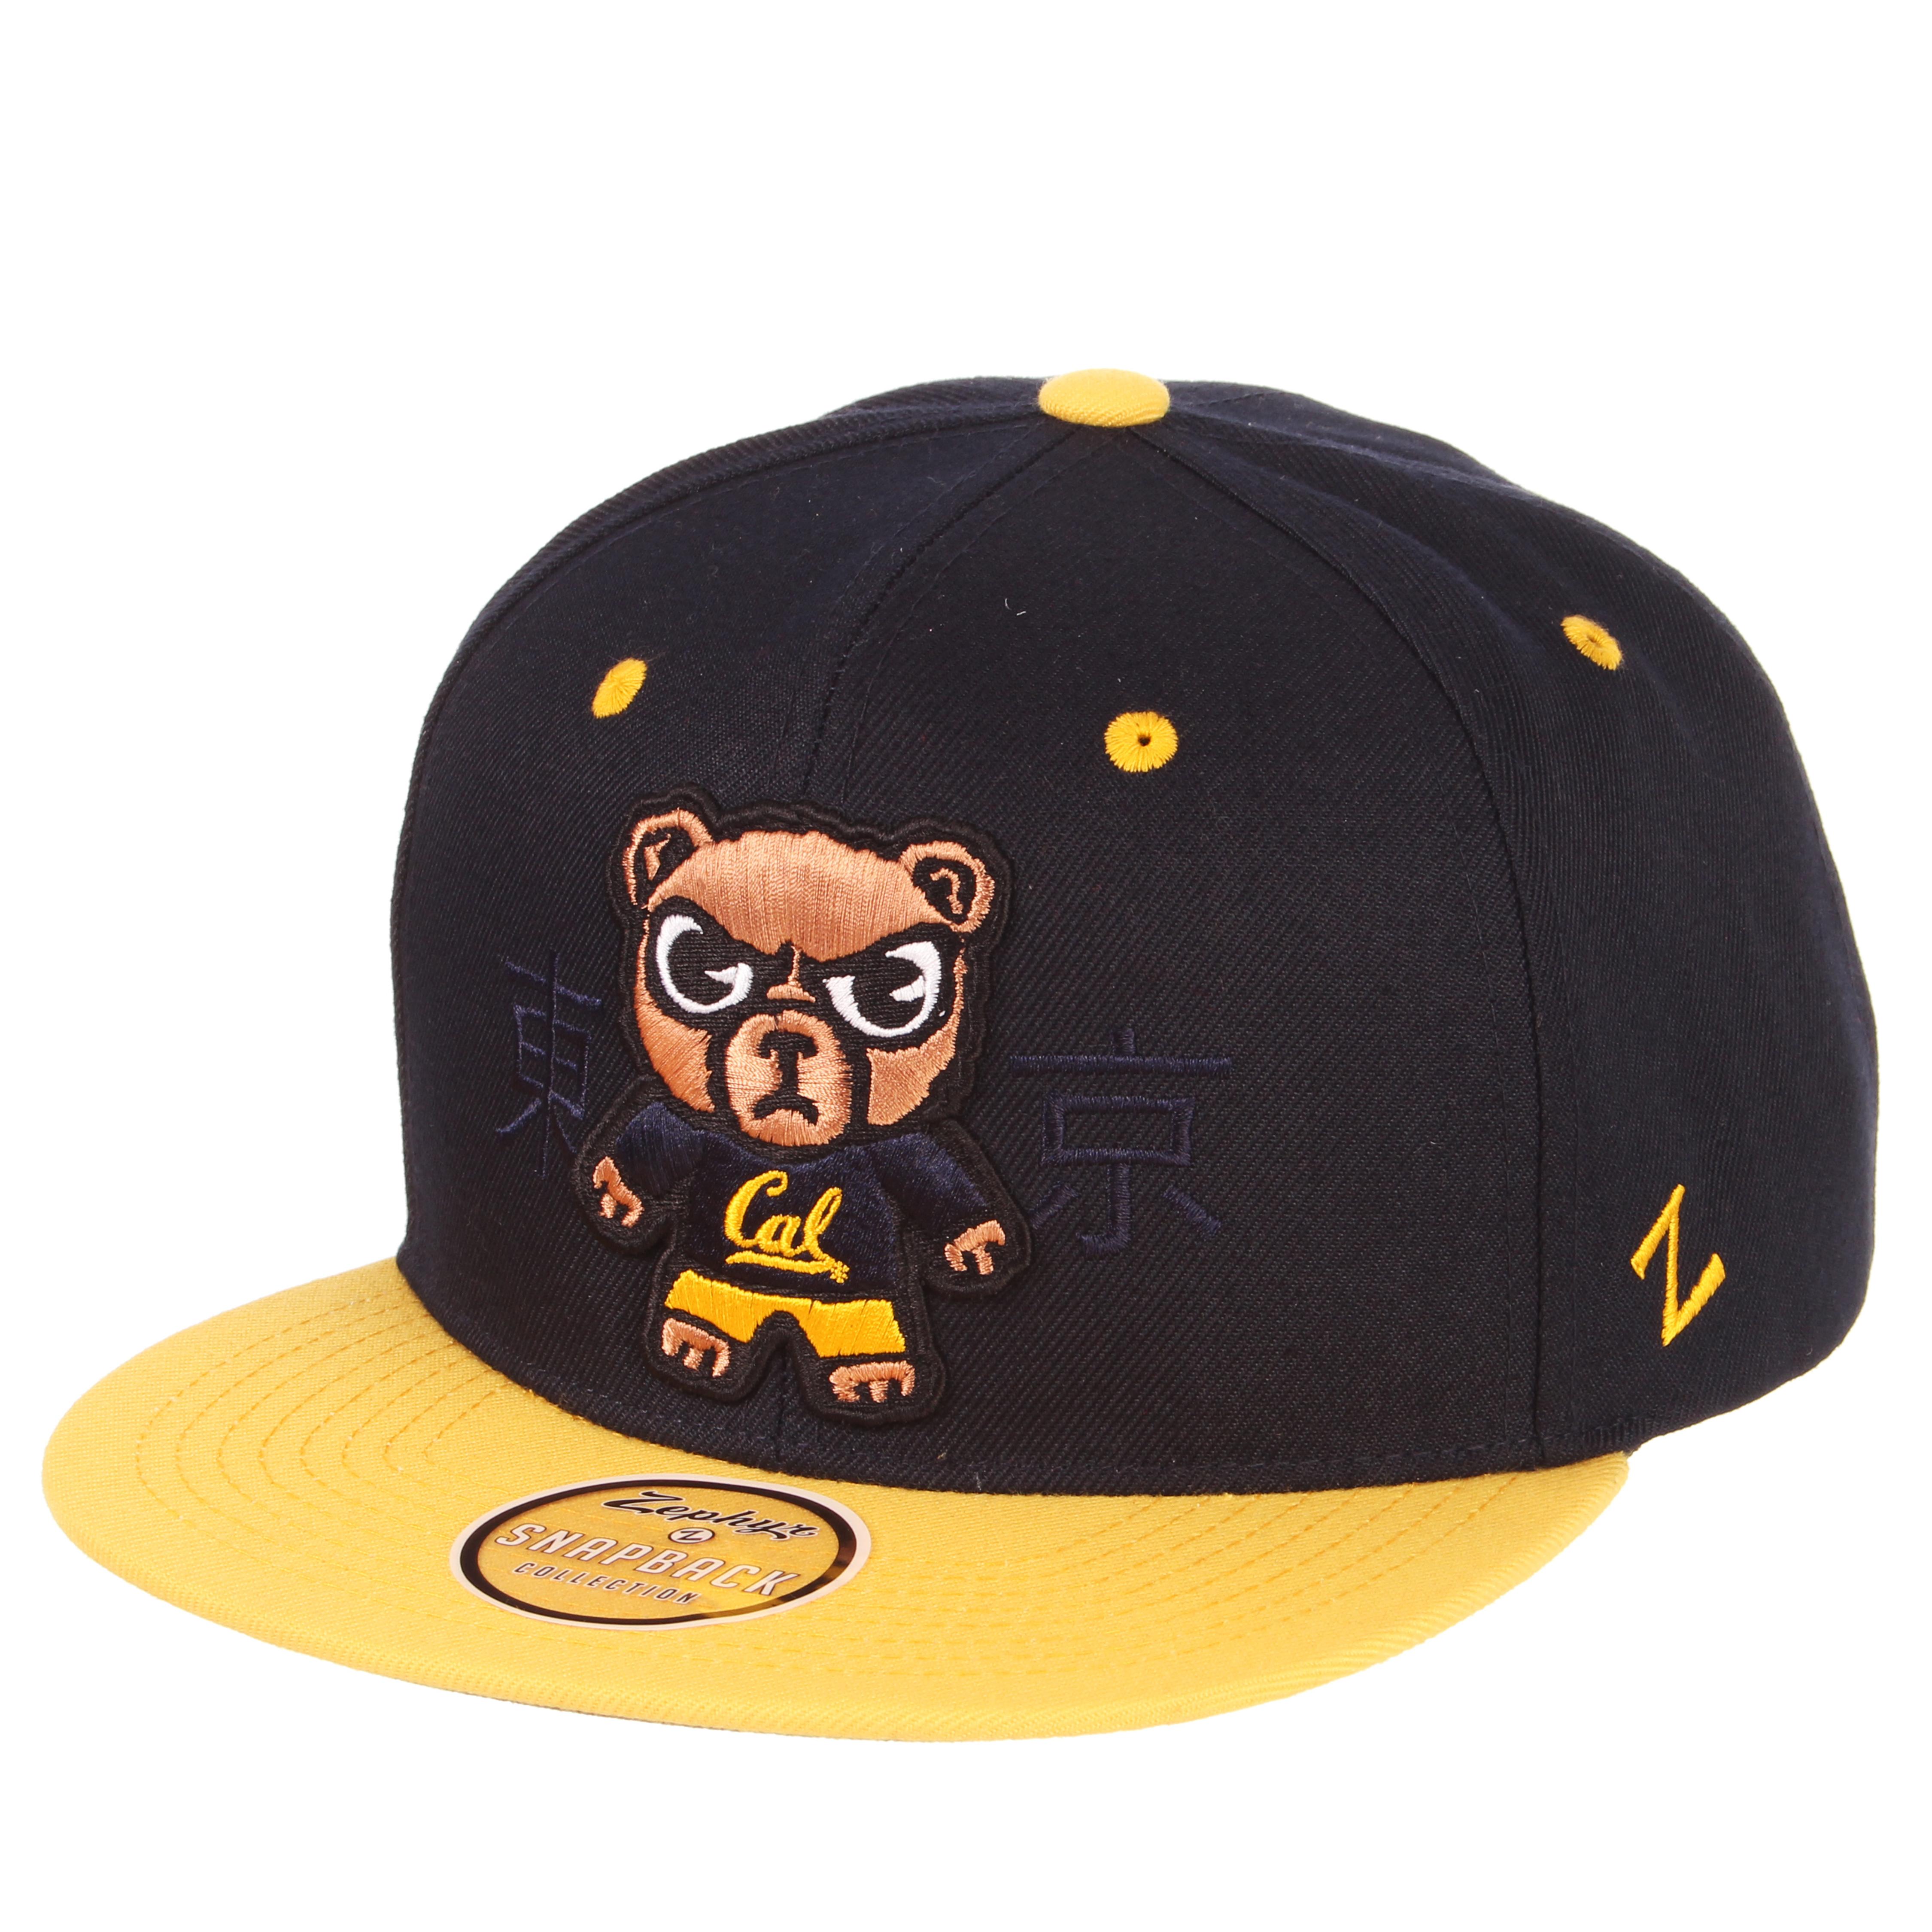 Cal Bears Zephyr Tokyodachi Flatbrim Snapback Hat